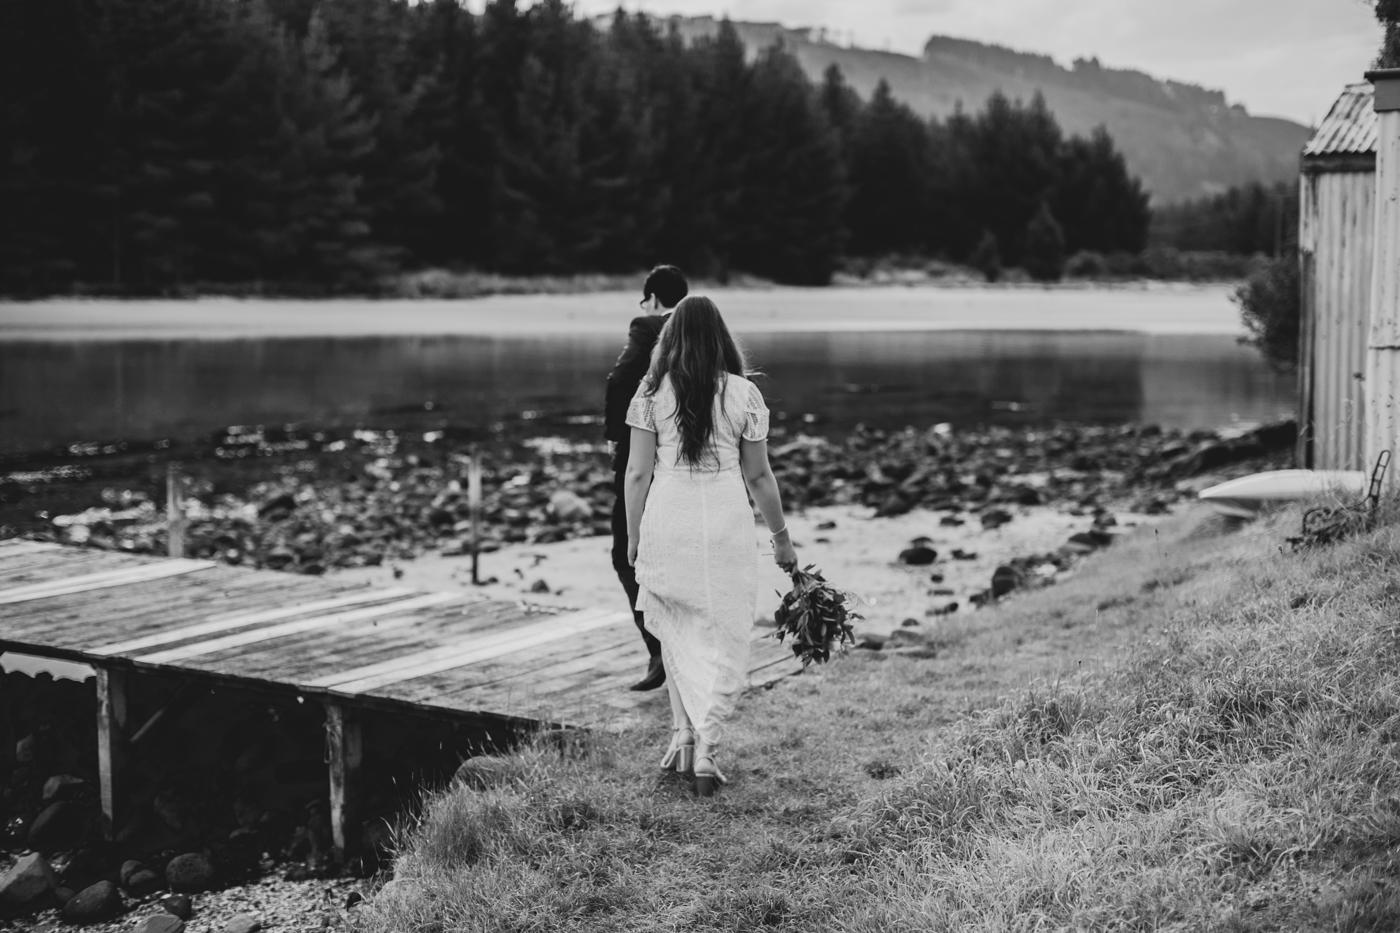 Ariana & Tim - Dunedin, New Zealand Wedding - Destination Wedding - Samantha Heather Photography-177.jpg